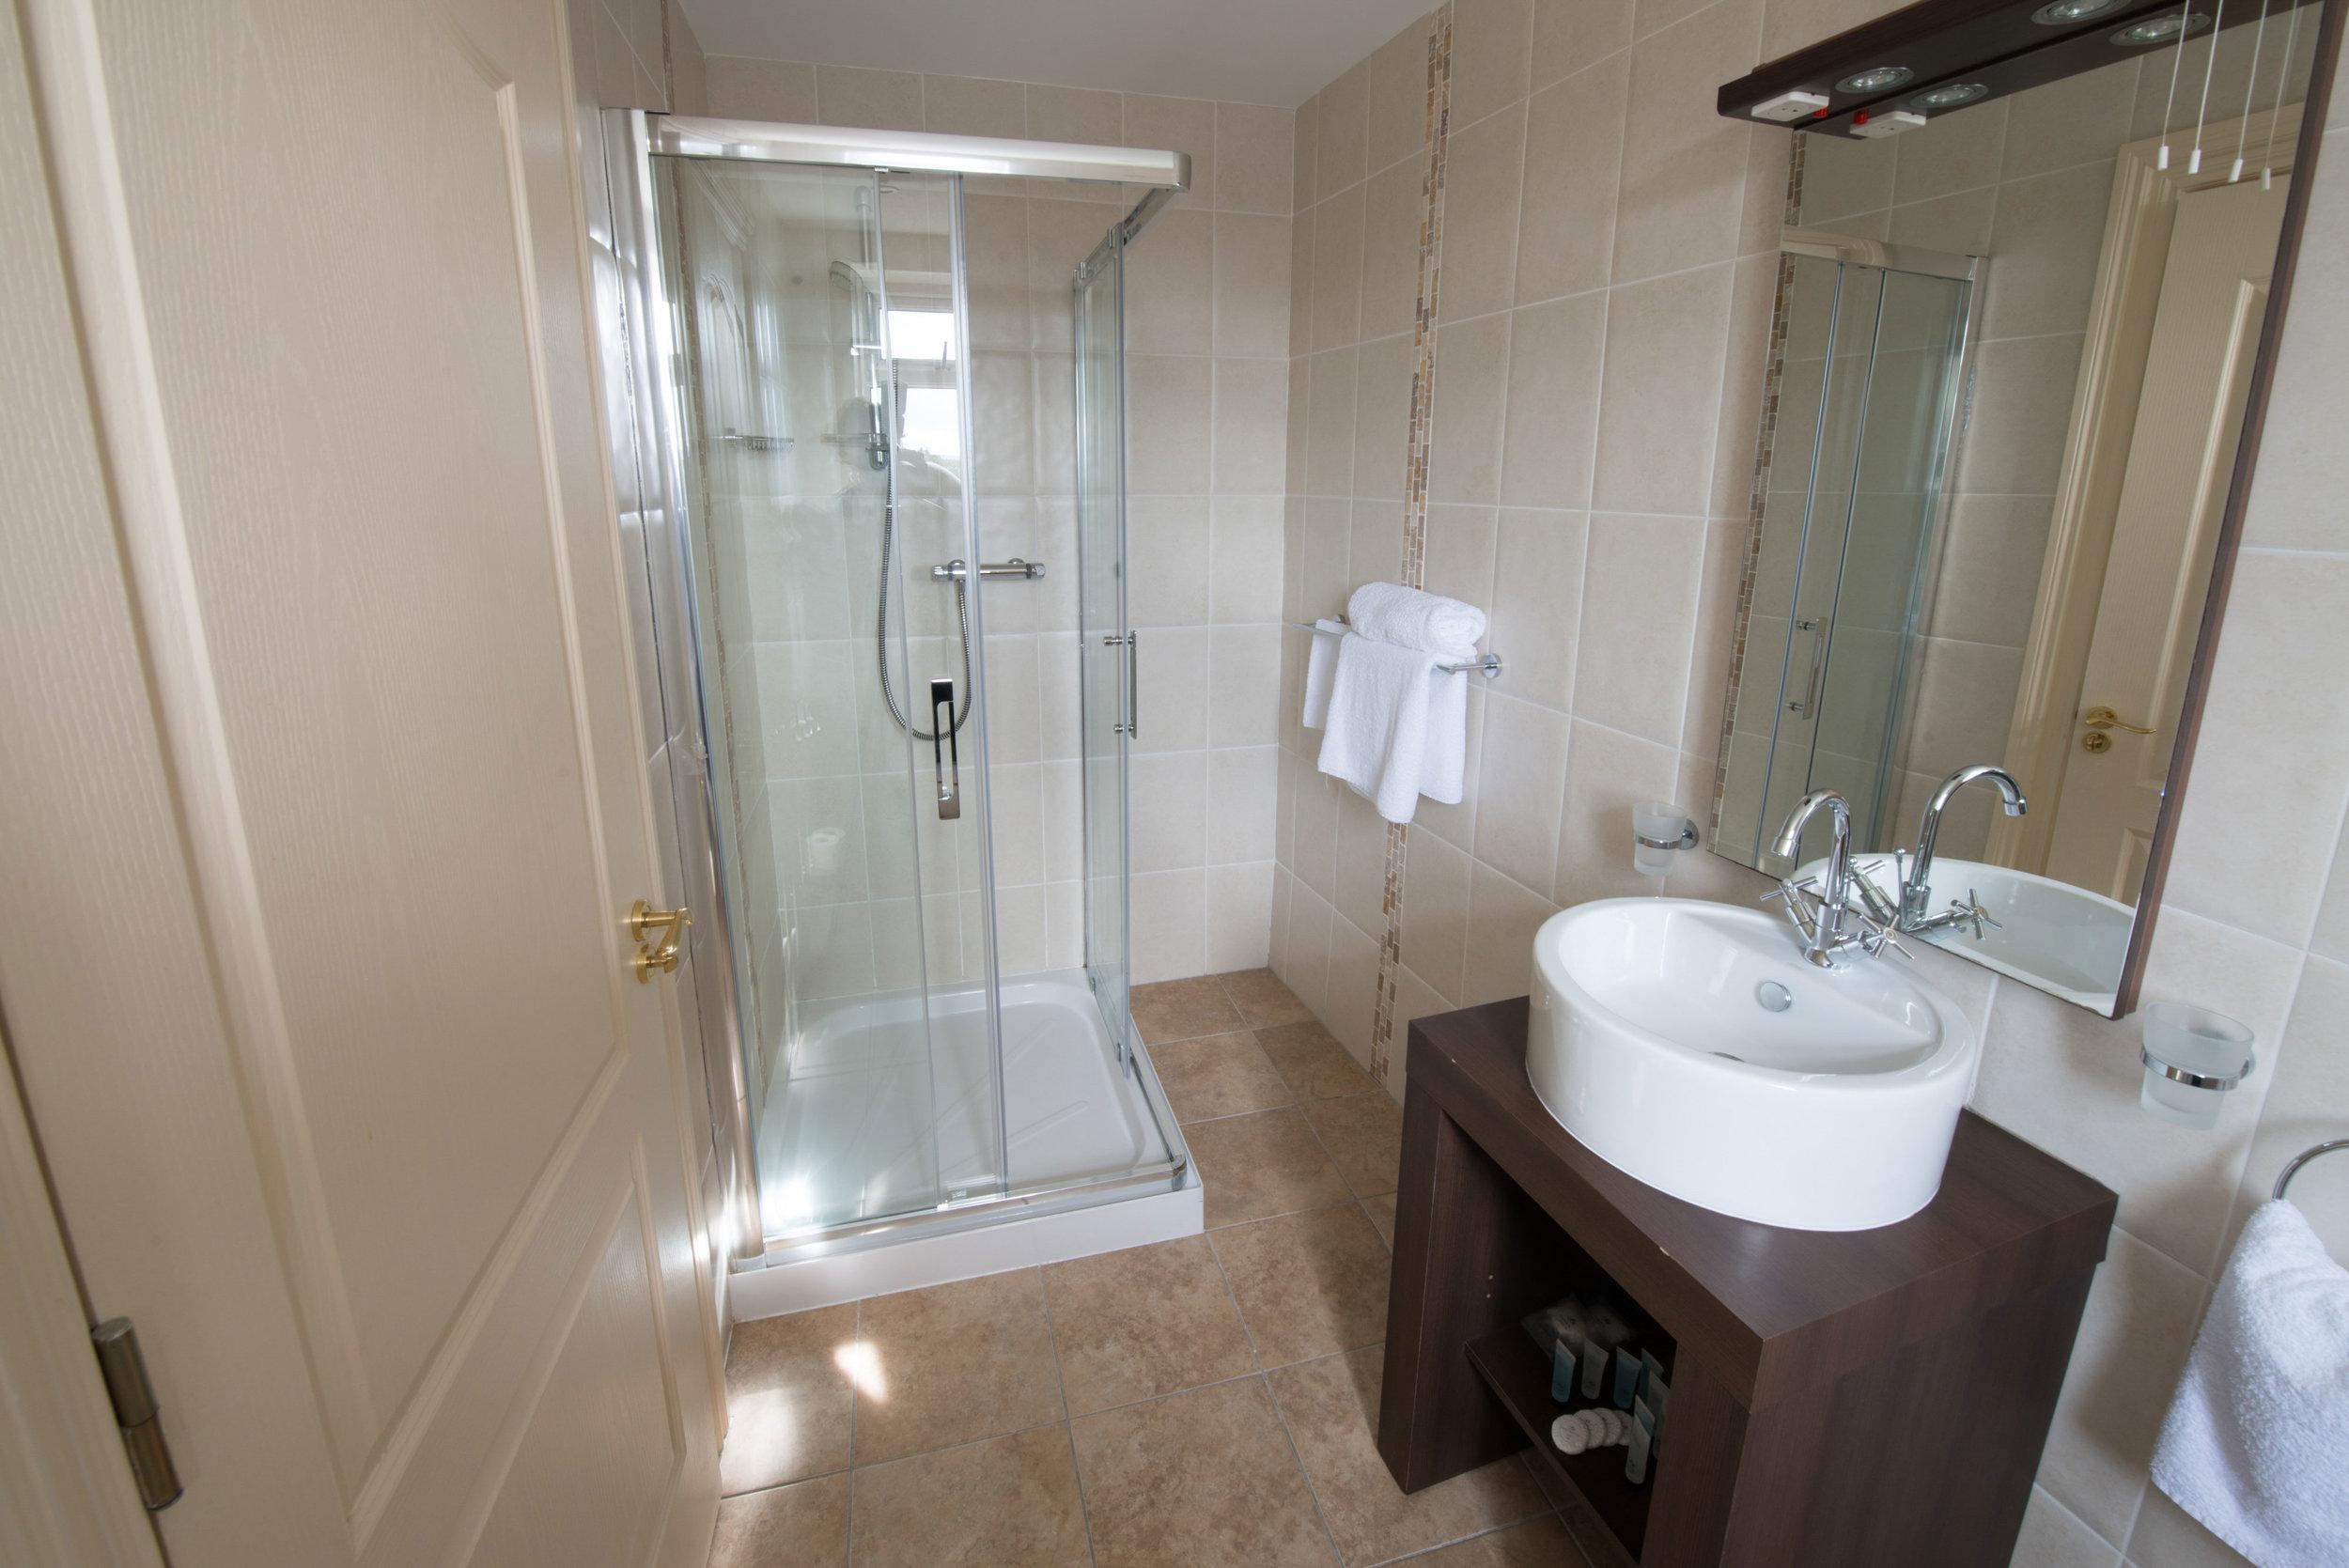 Connemara-Lake-Hotel-Bathroom.png